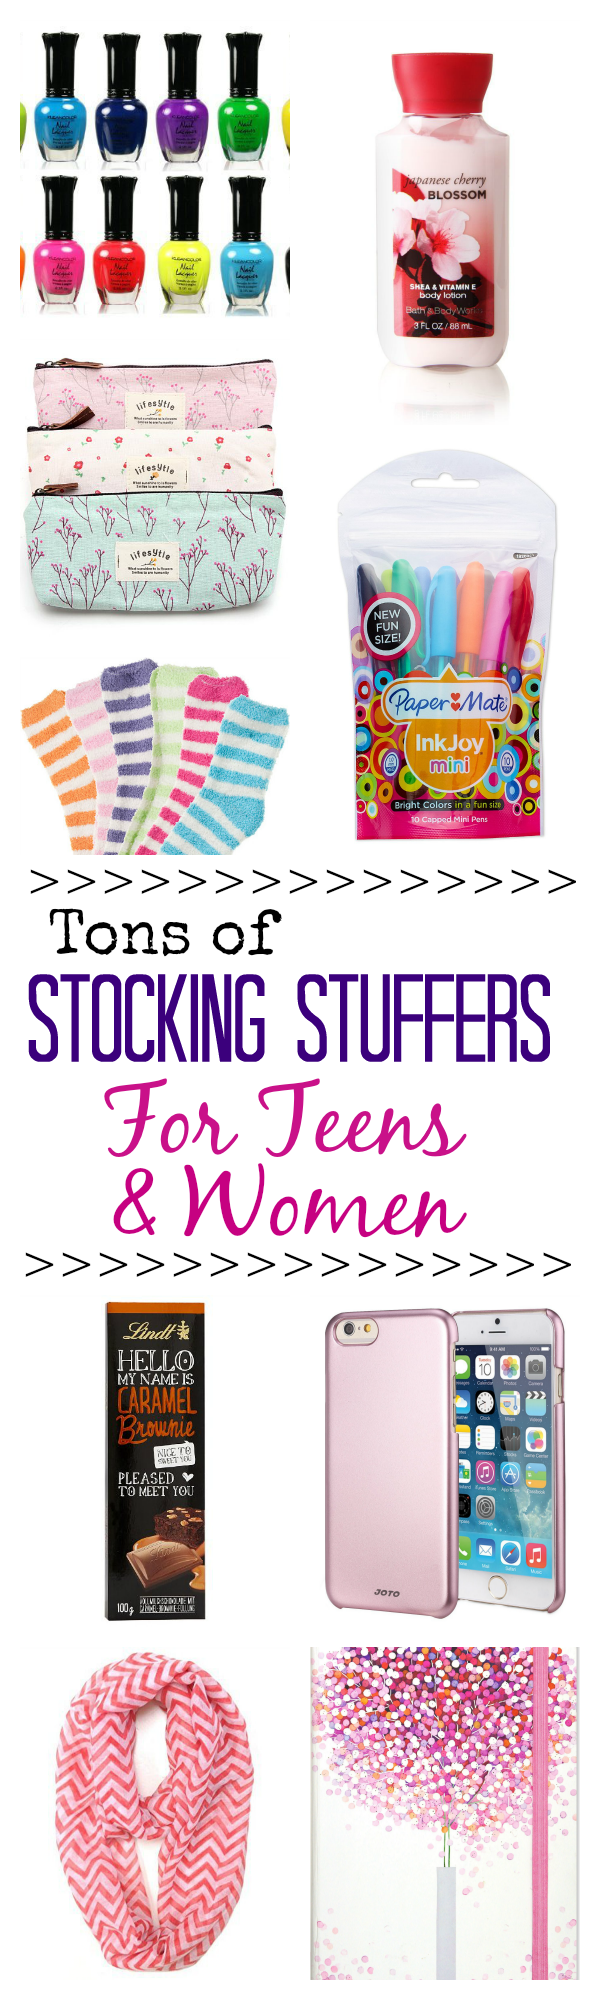 huge stocking stuffer ideas list | stocking stuffers, stockings